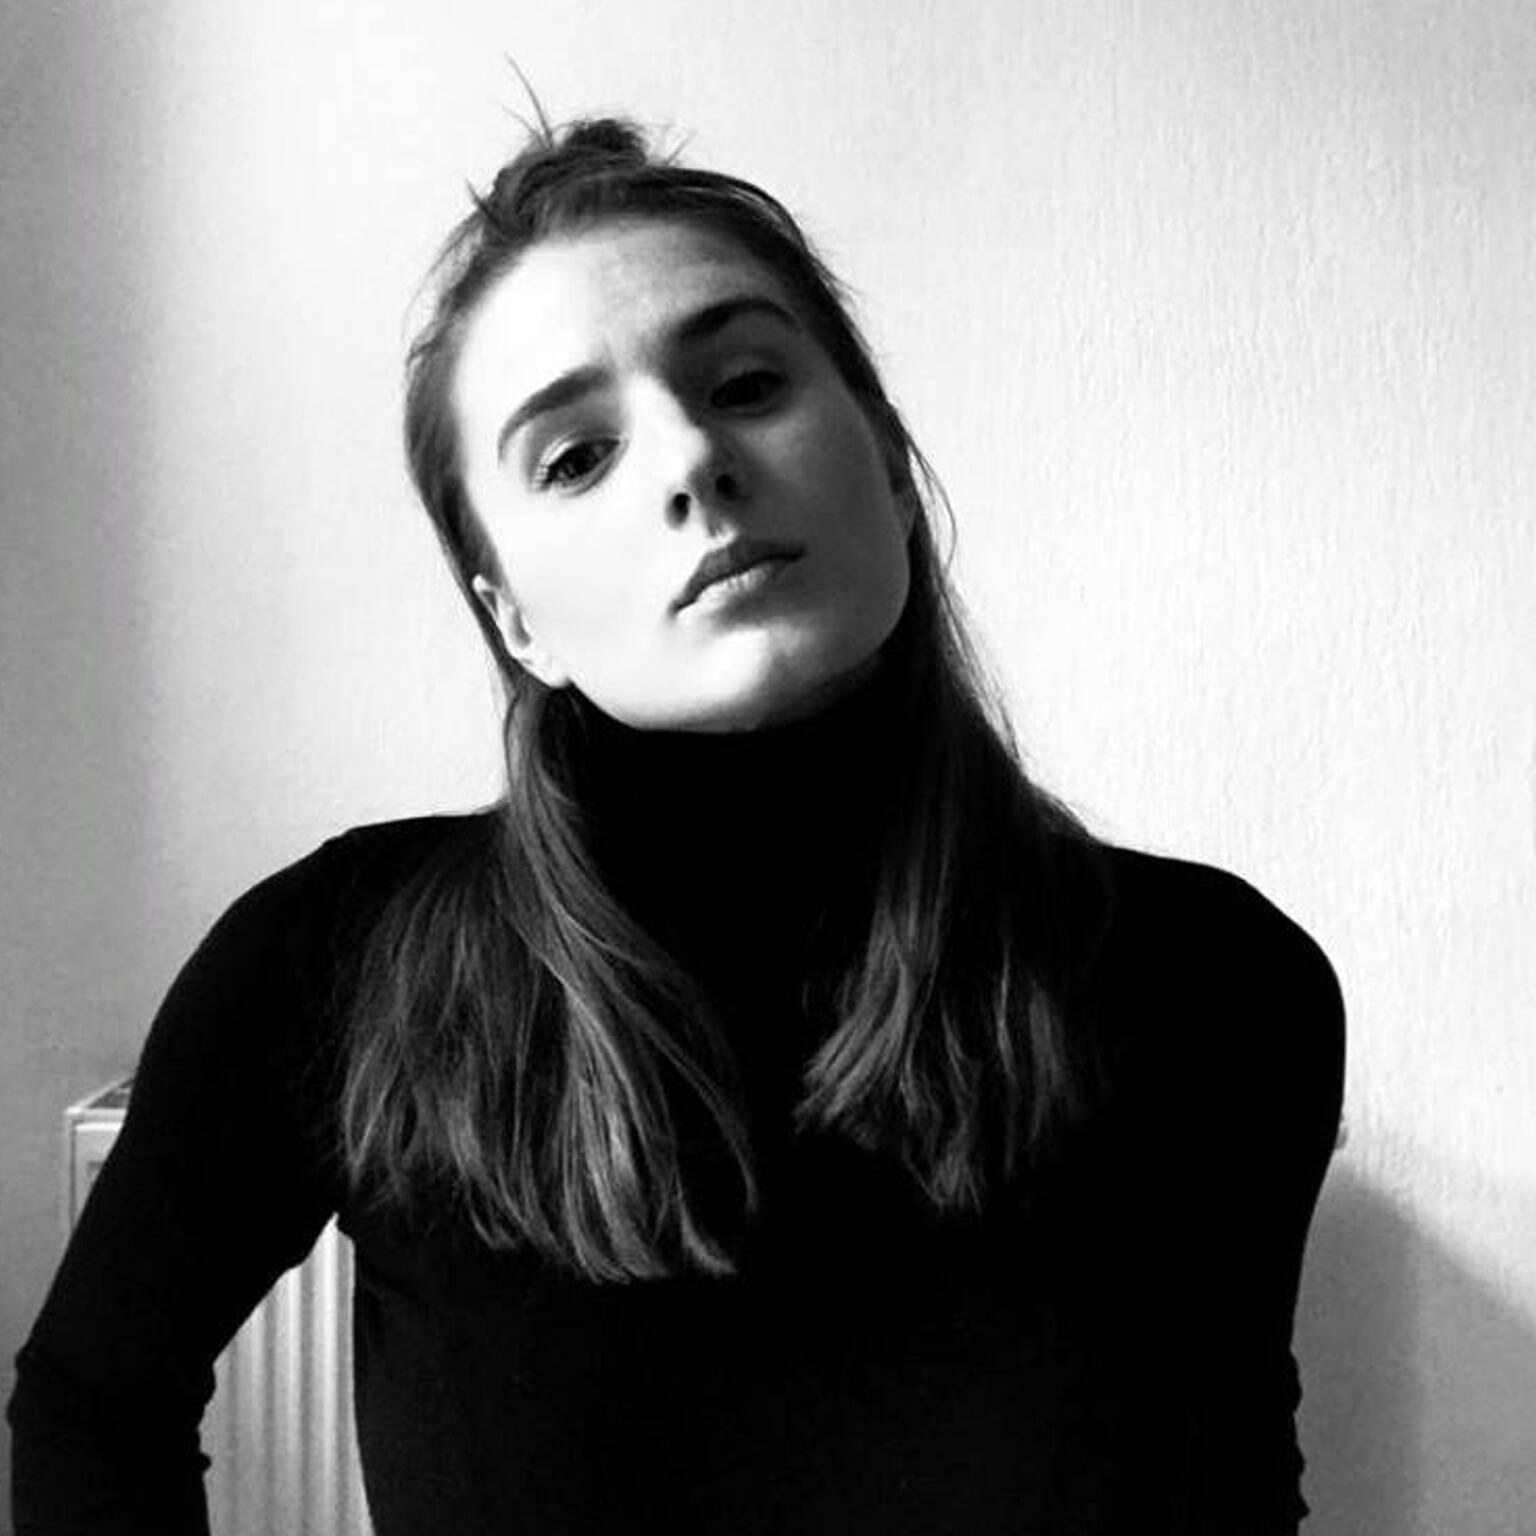 Photo of Aneta Hudzik